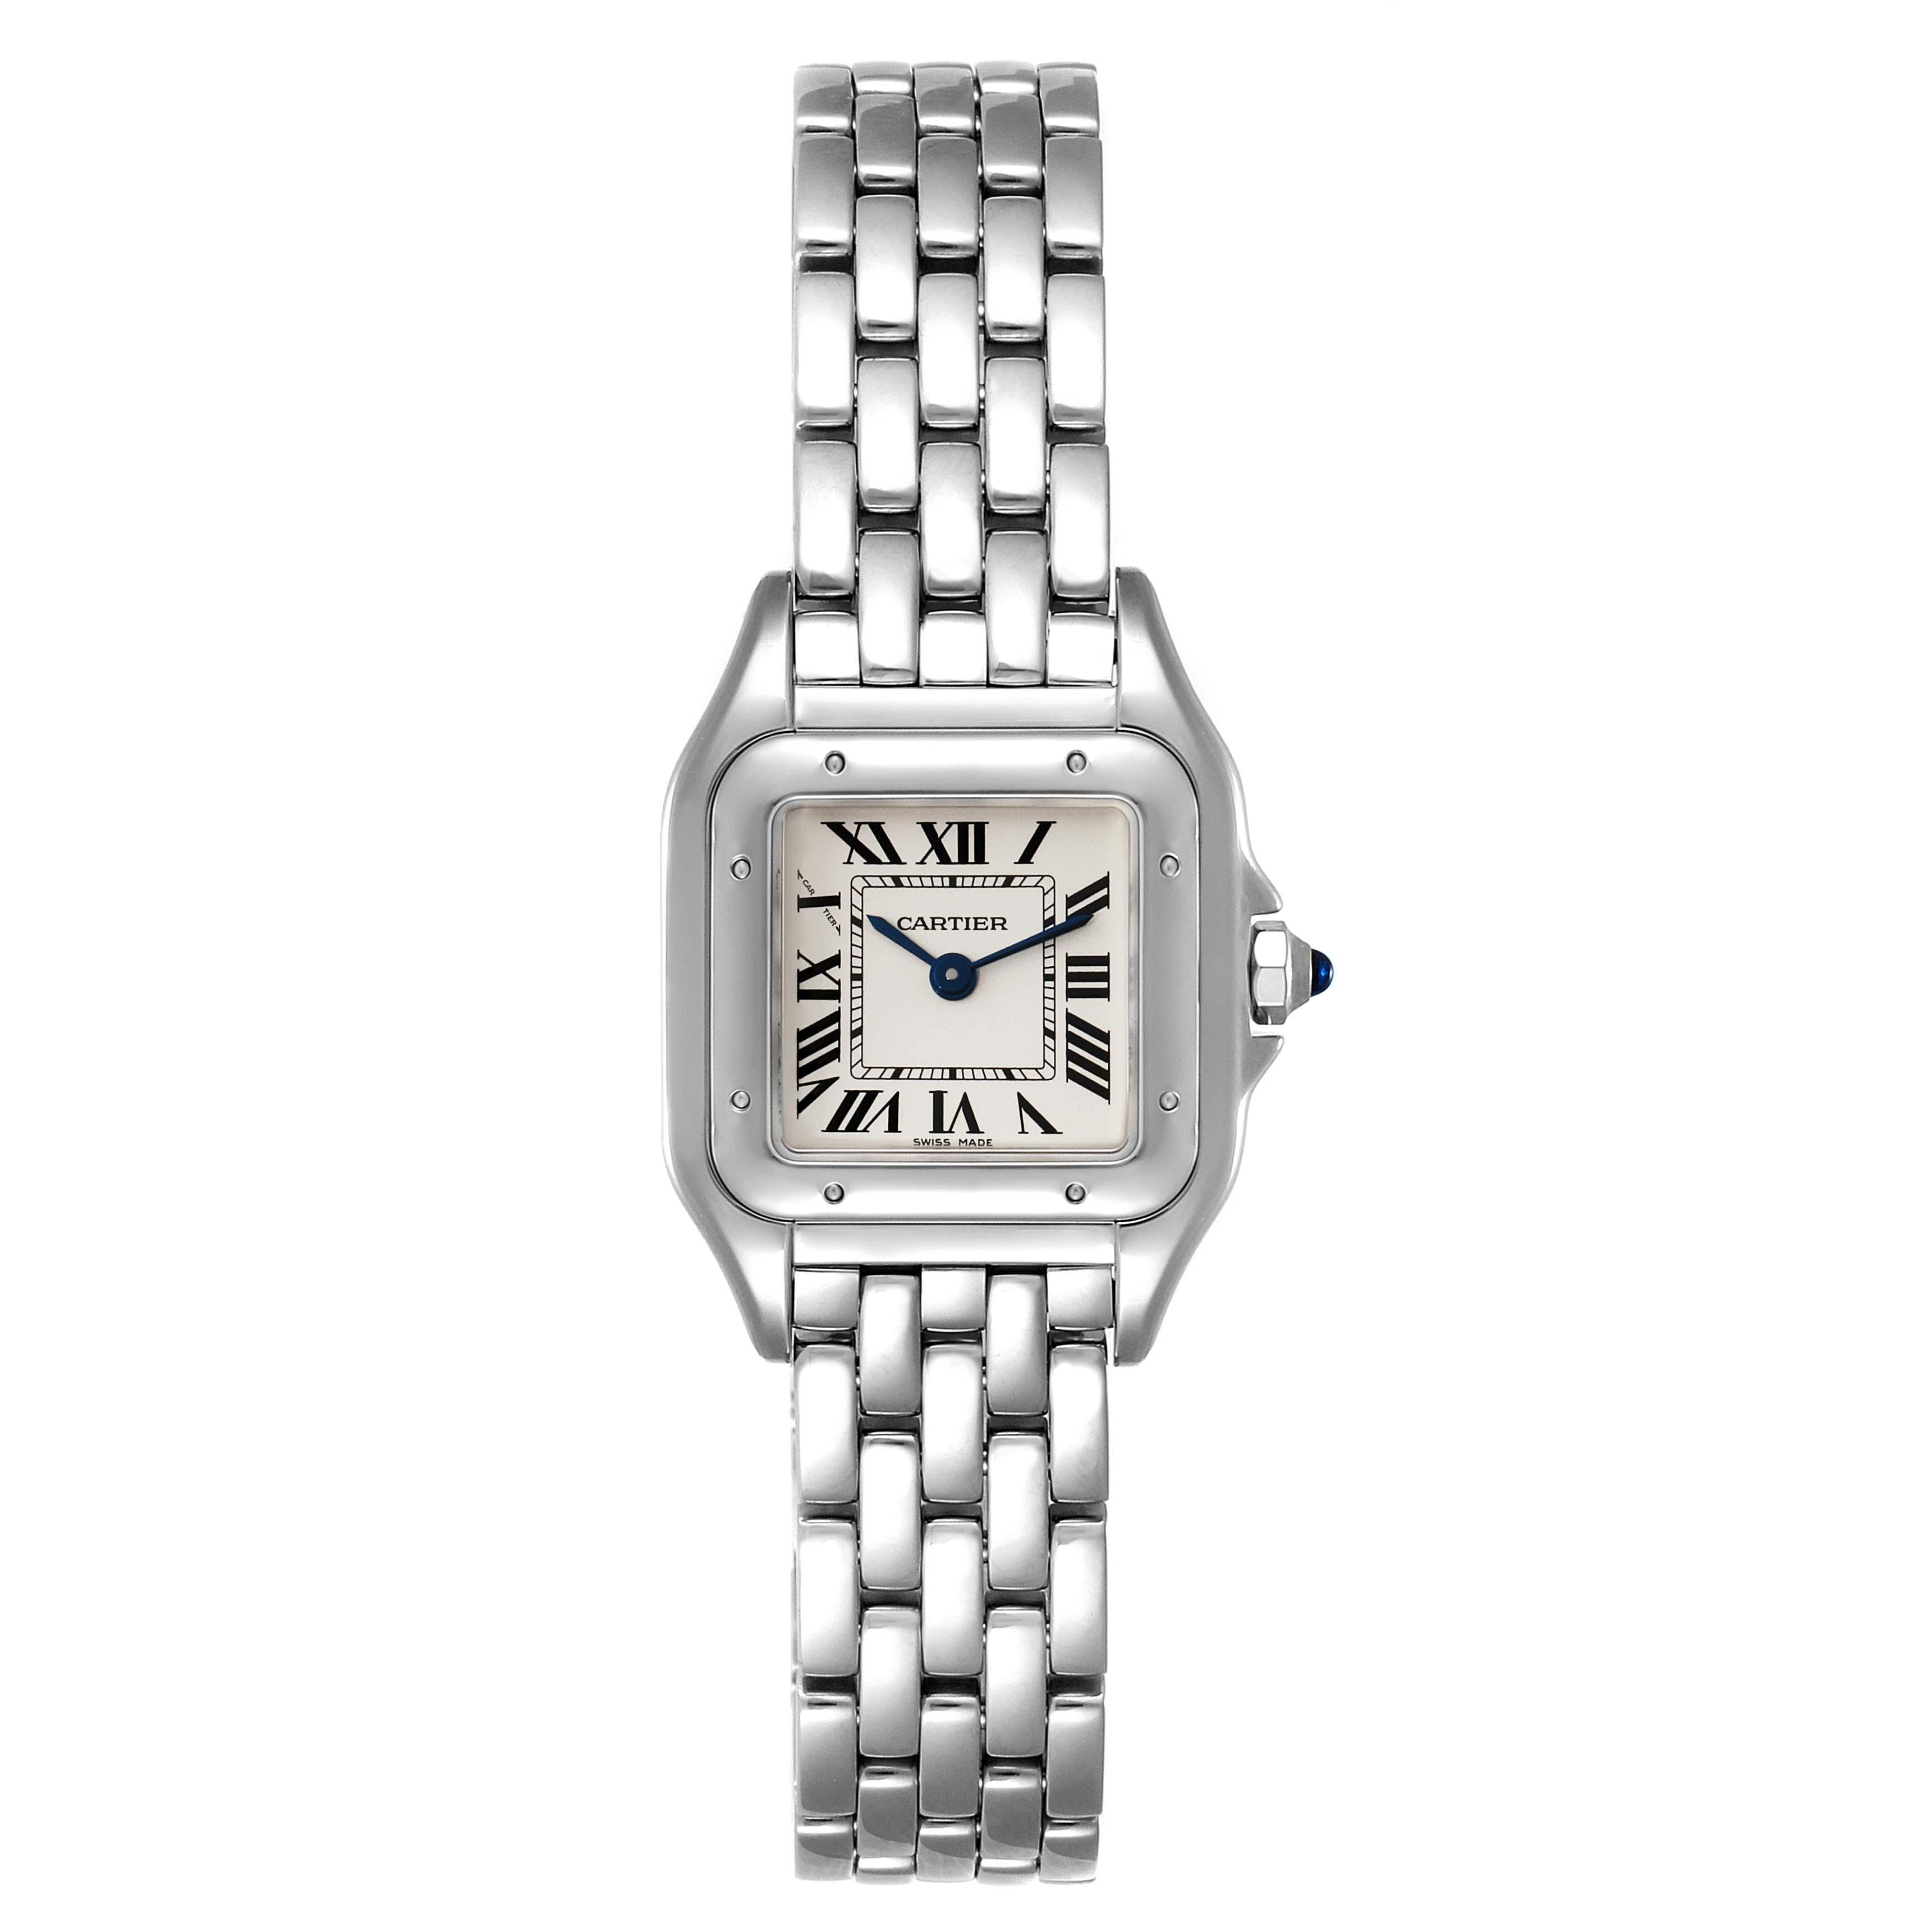 Cartier Panthere Midsize 22mm Steel Ladies Watch WSPN0006 Box SwissWatchExpo